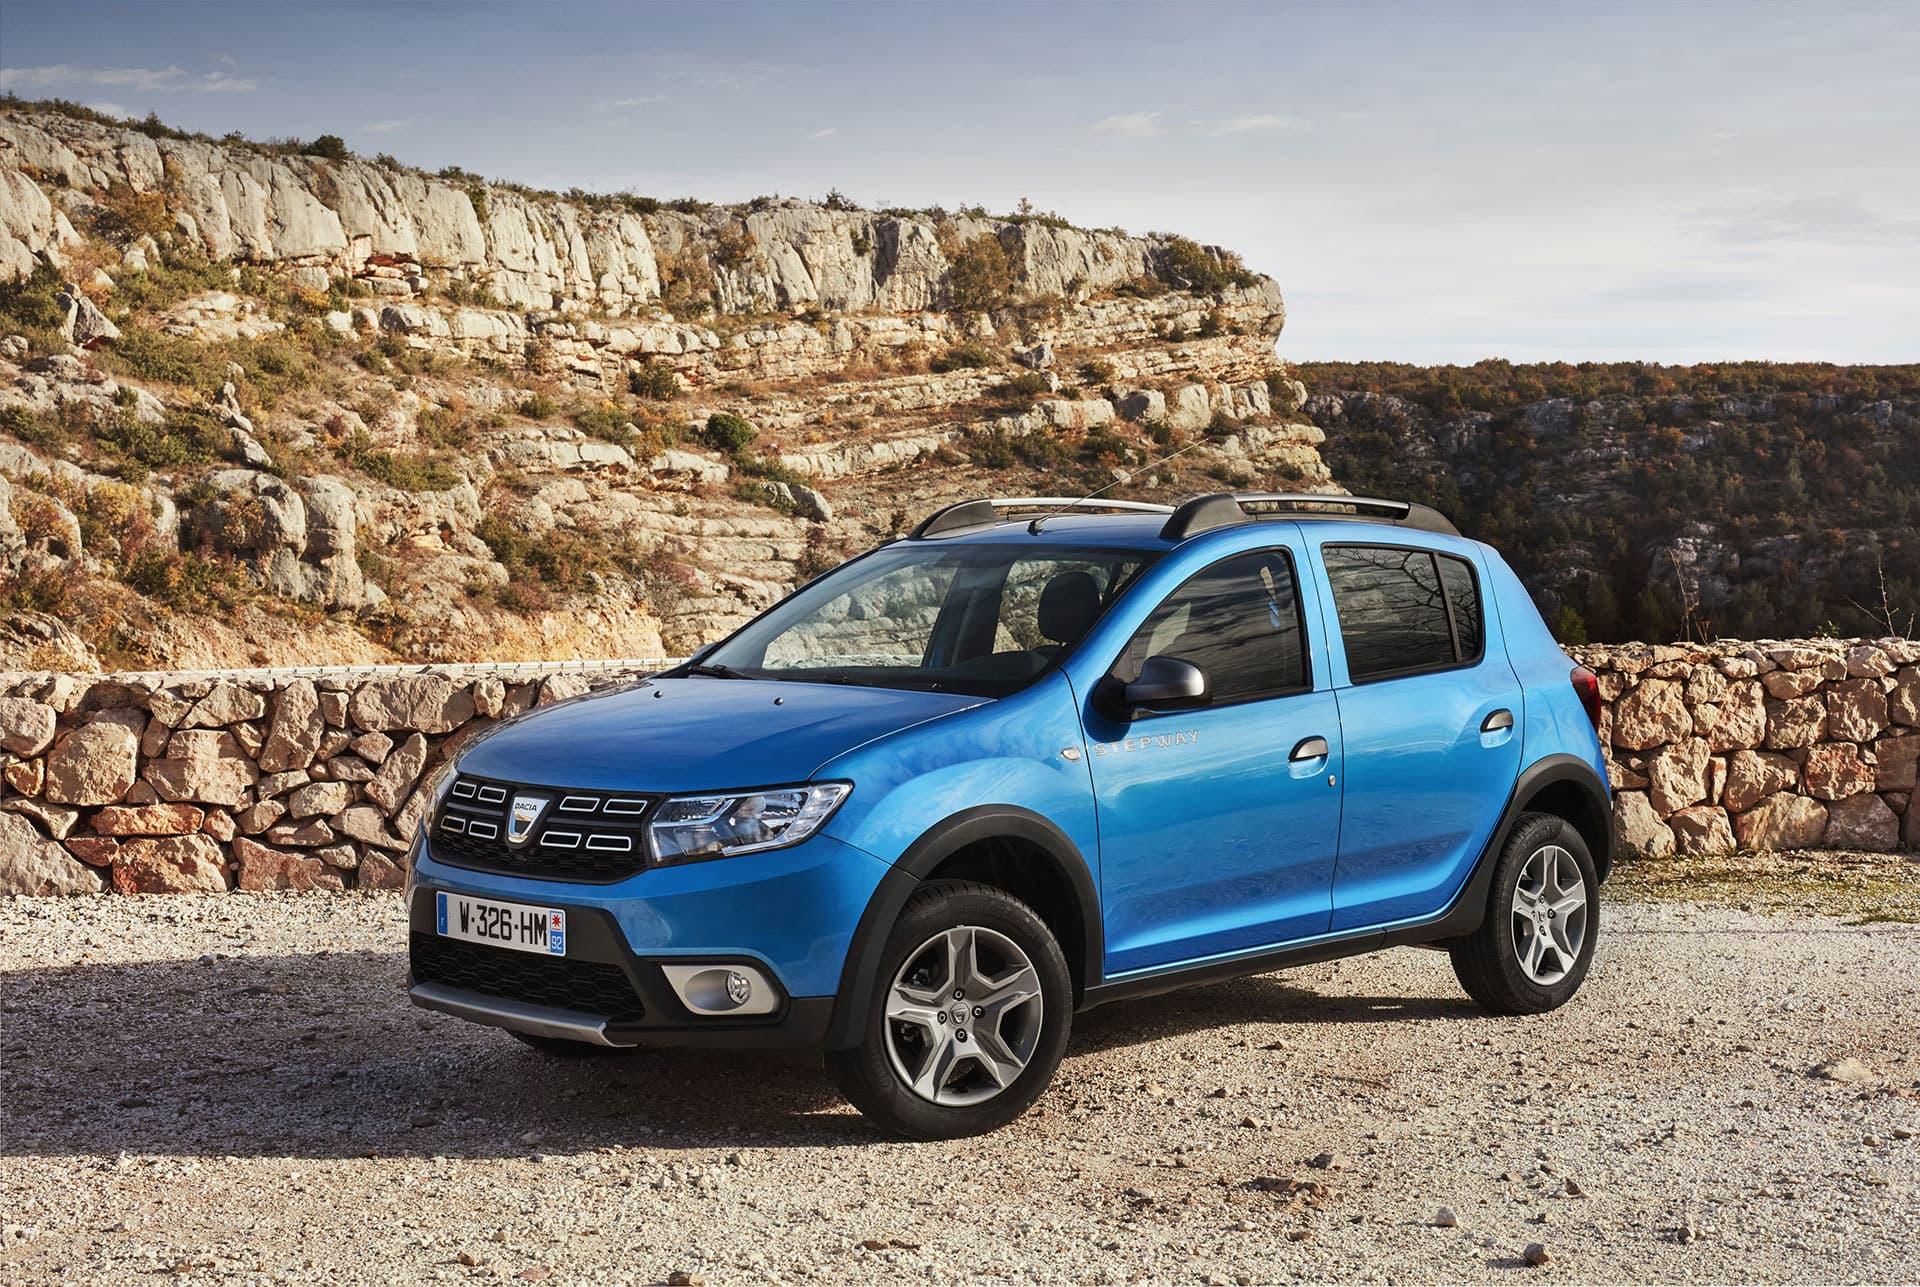 Dacia Sandero Stepway 2019 Azul 13